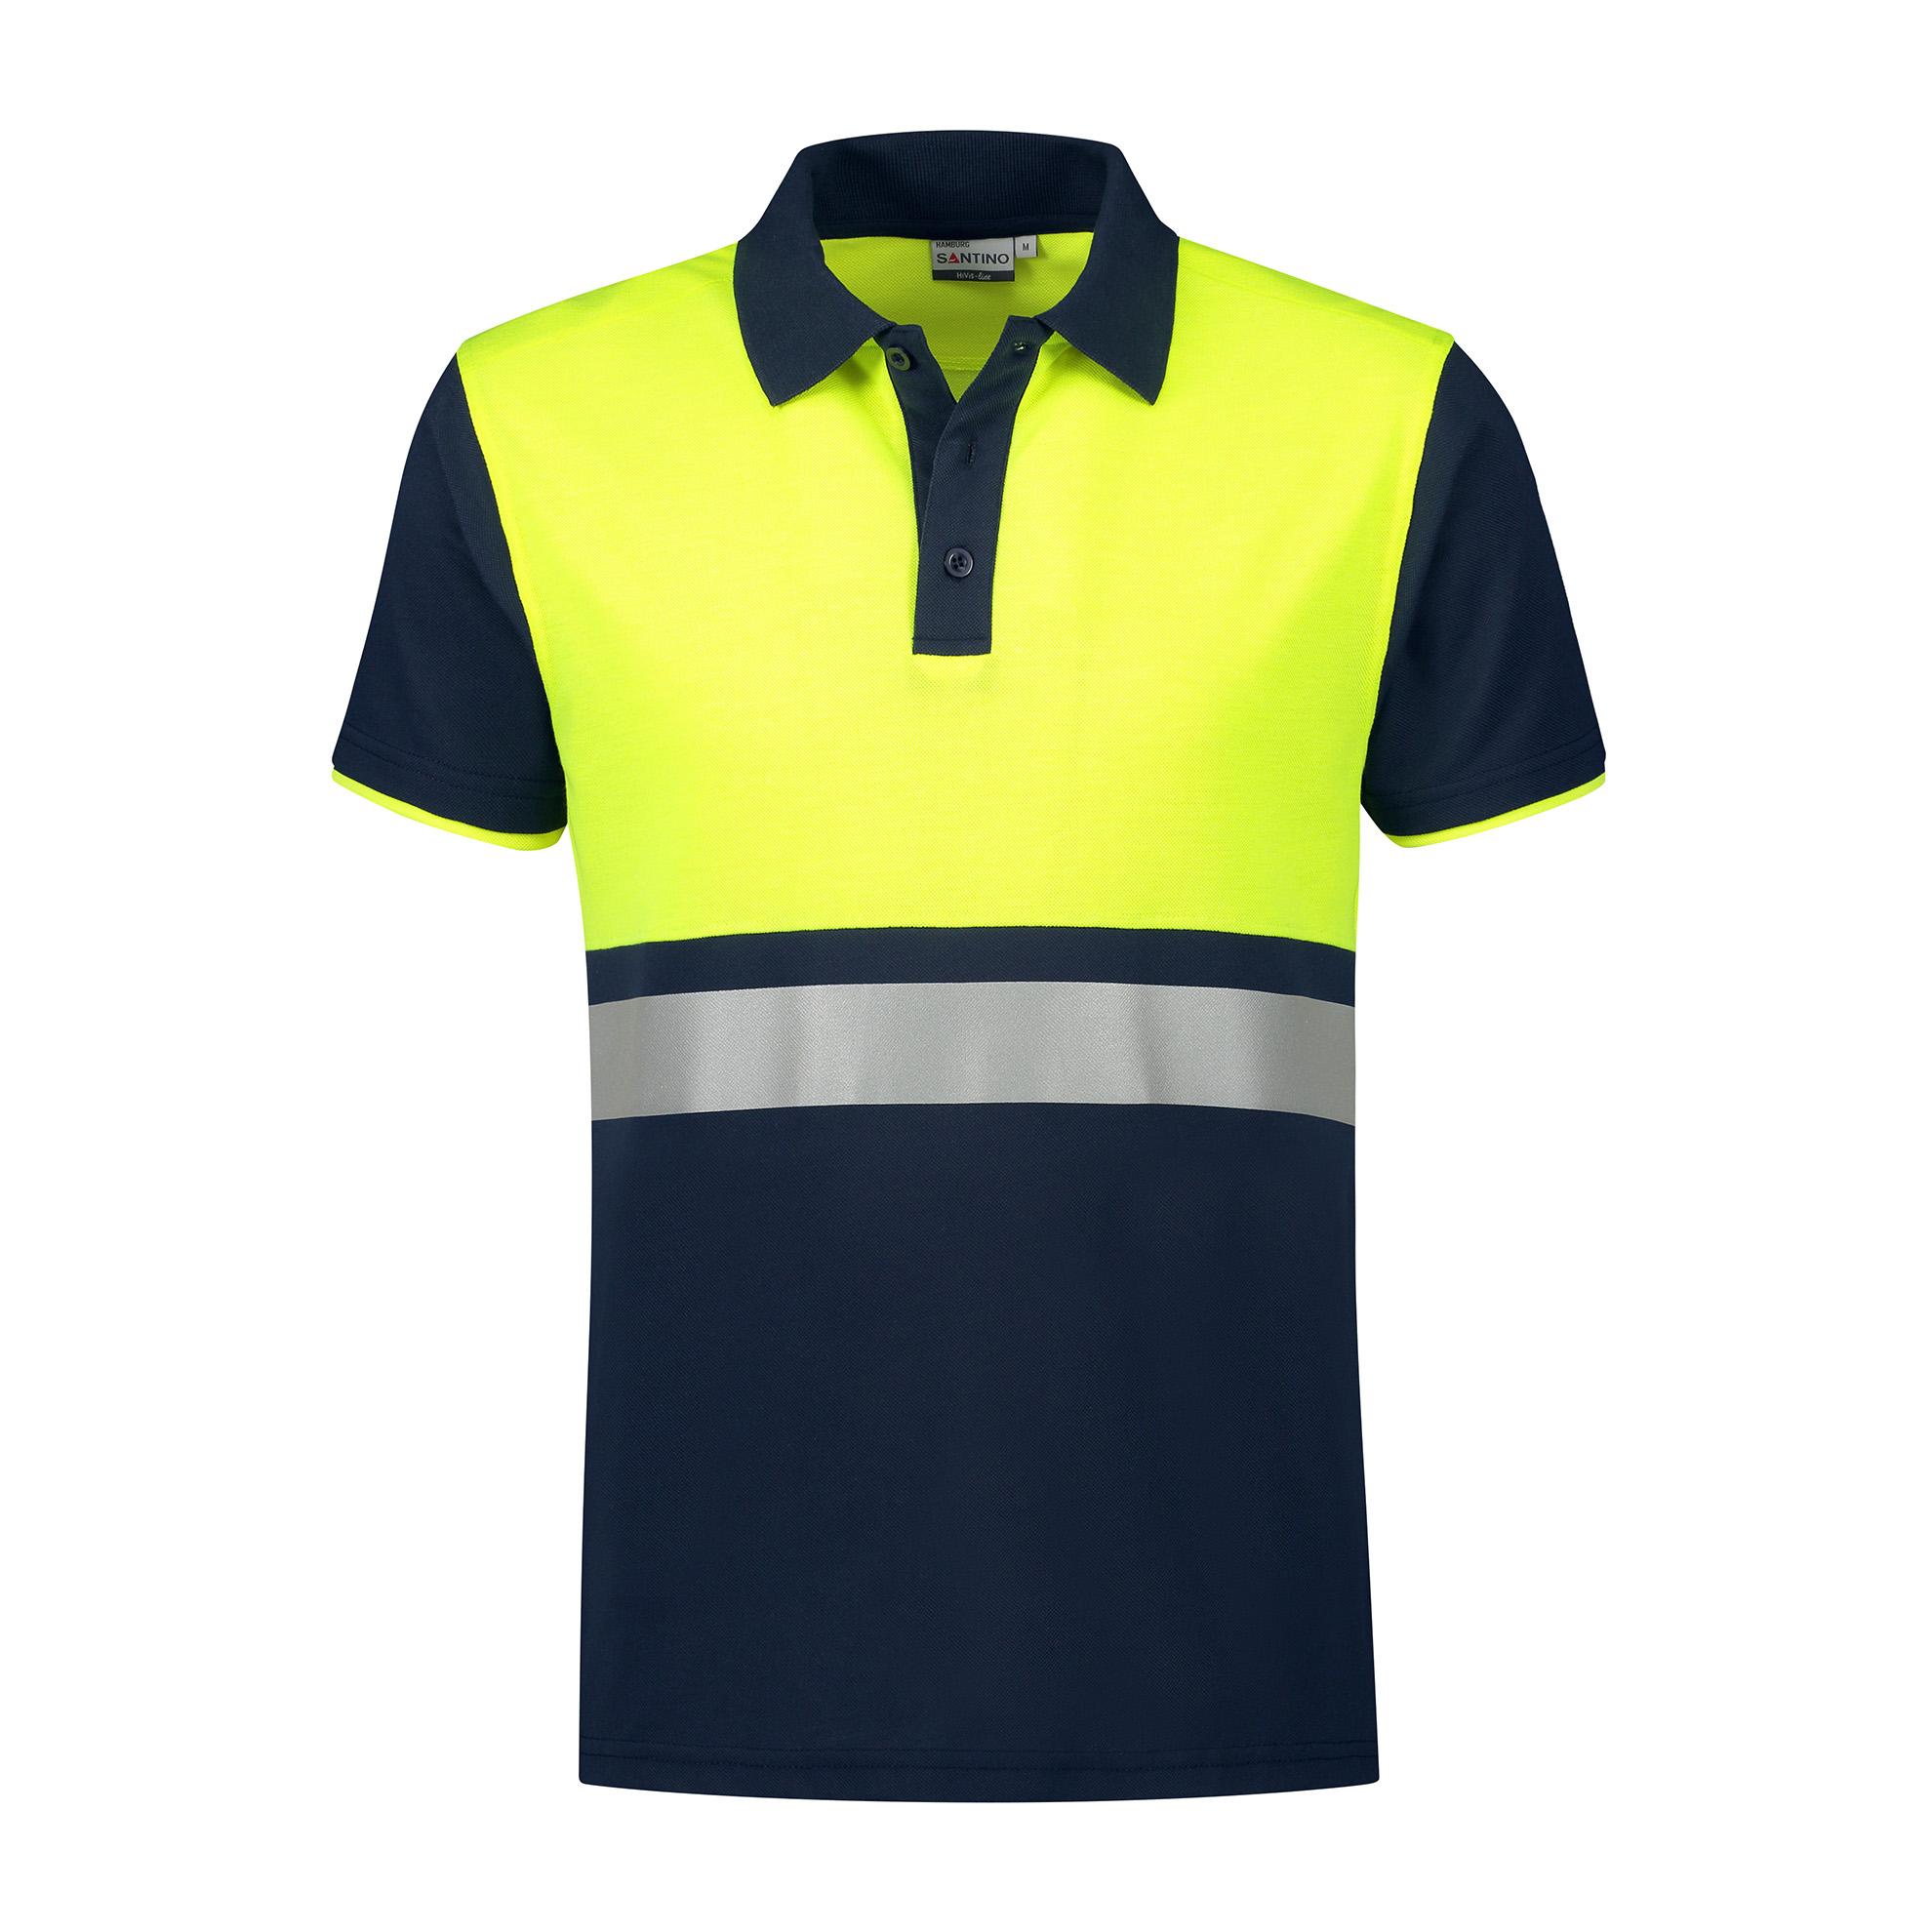 Santino Poloshirt Hamburg Marineblau/Fluor Yellow Gr. L